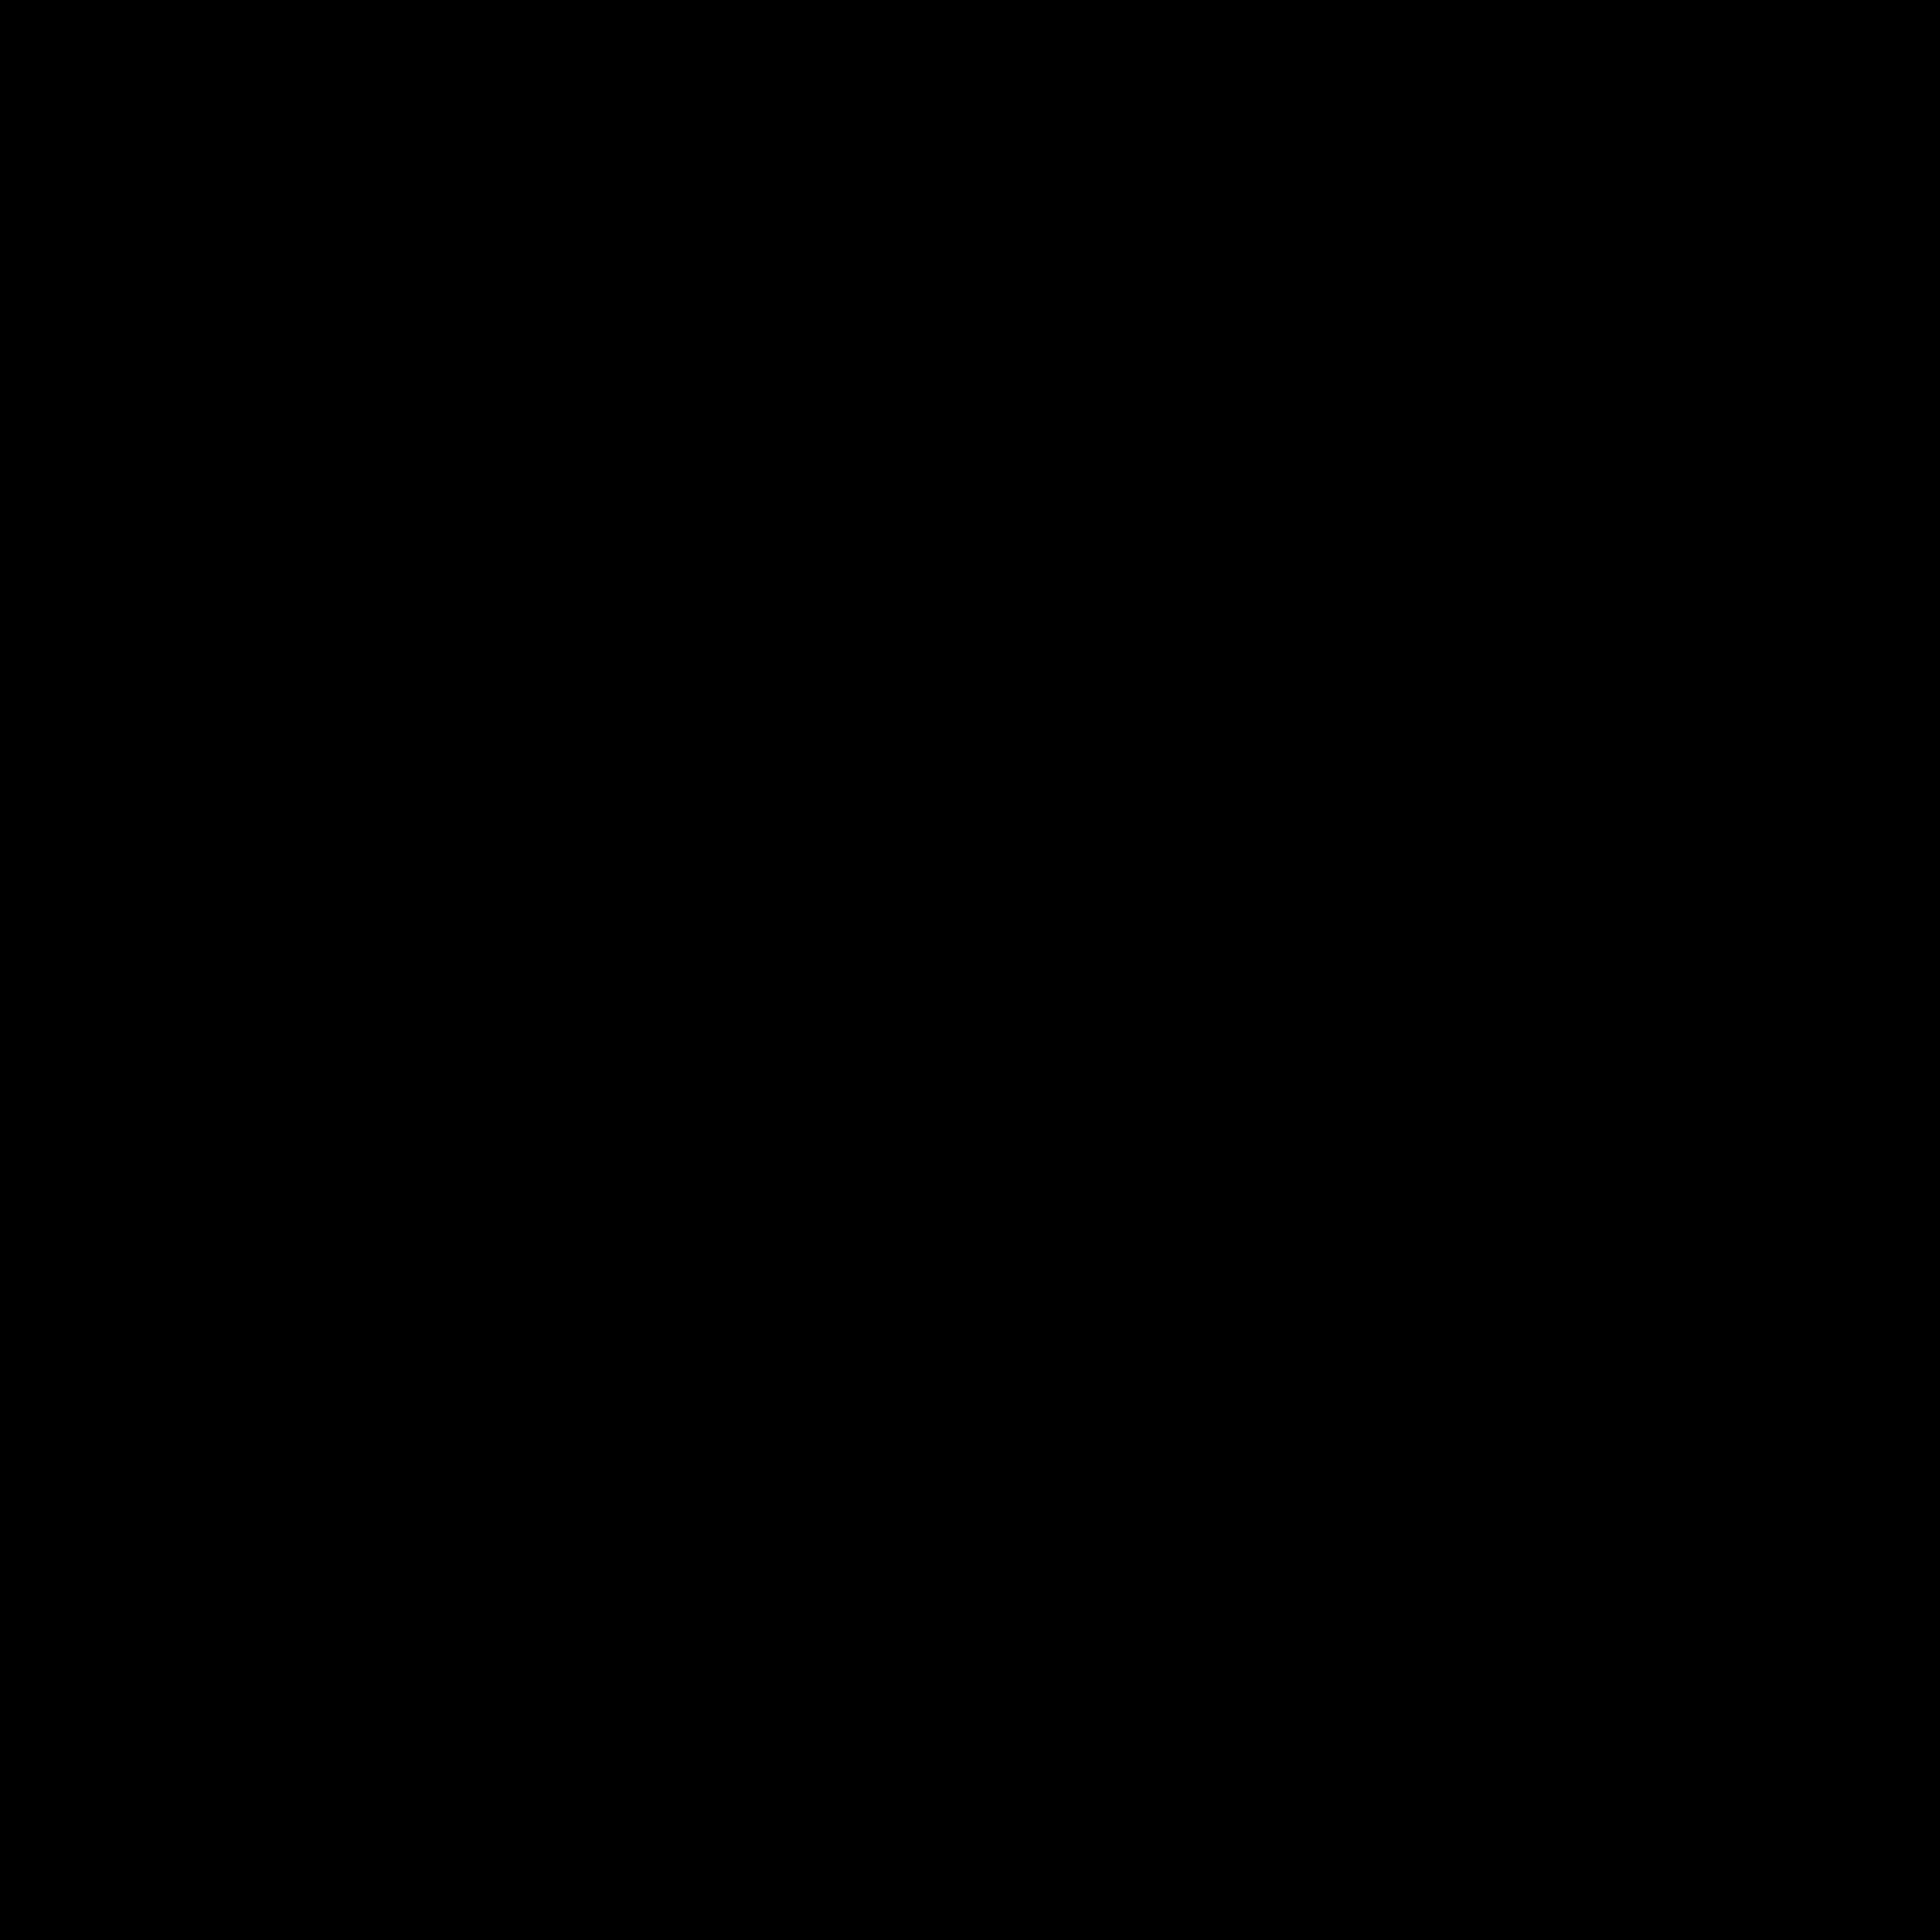 Radio Bluetooth «Ducretet Thomson L646» – 1955